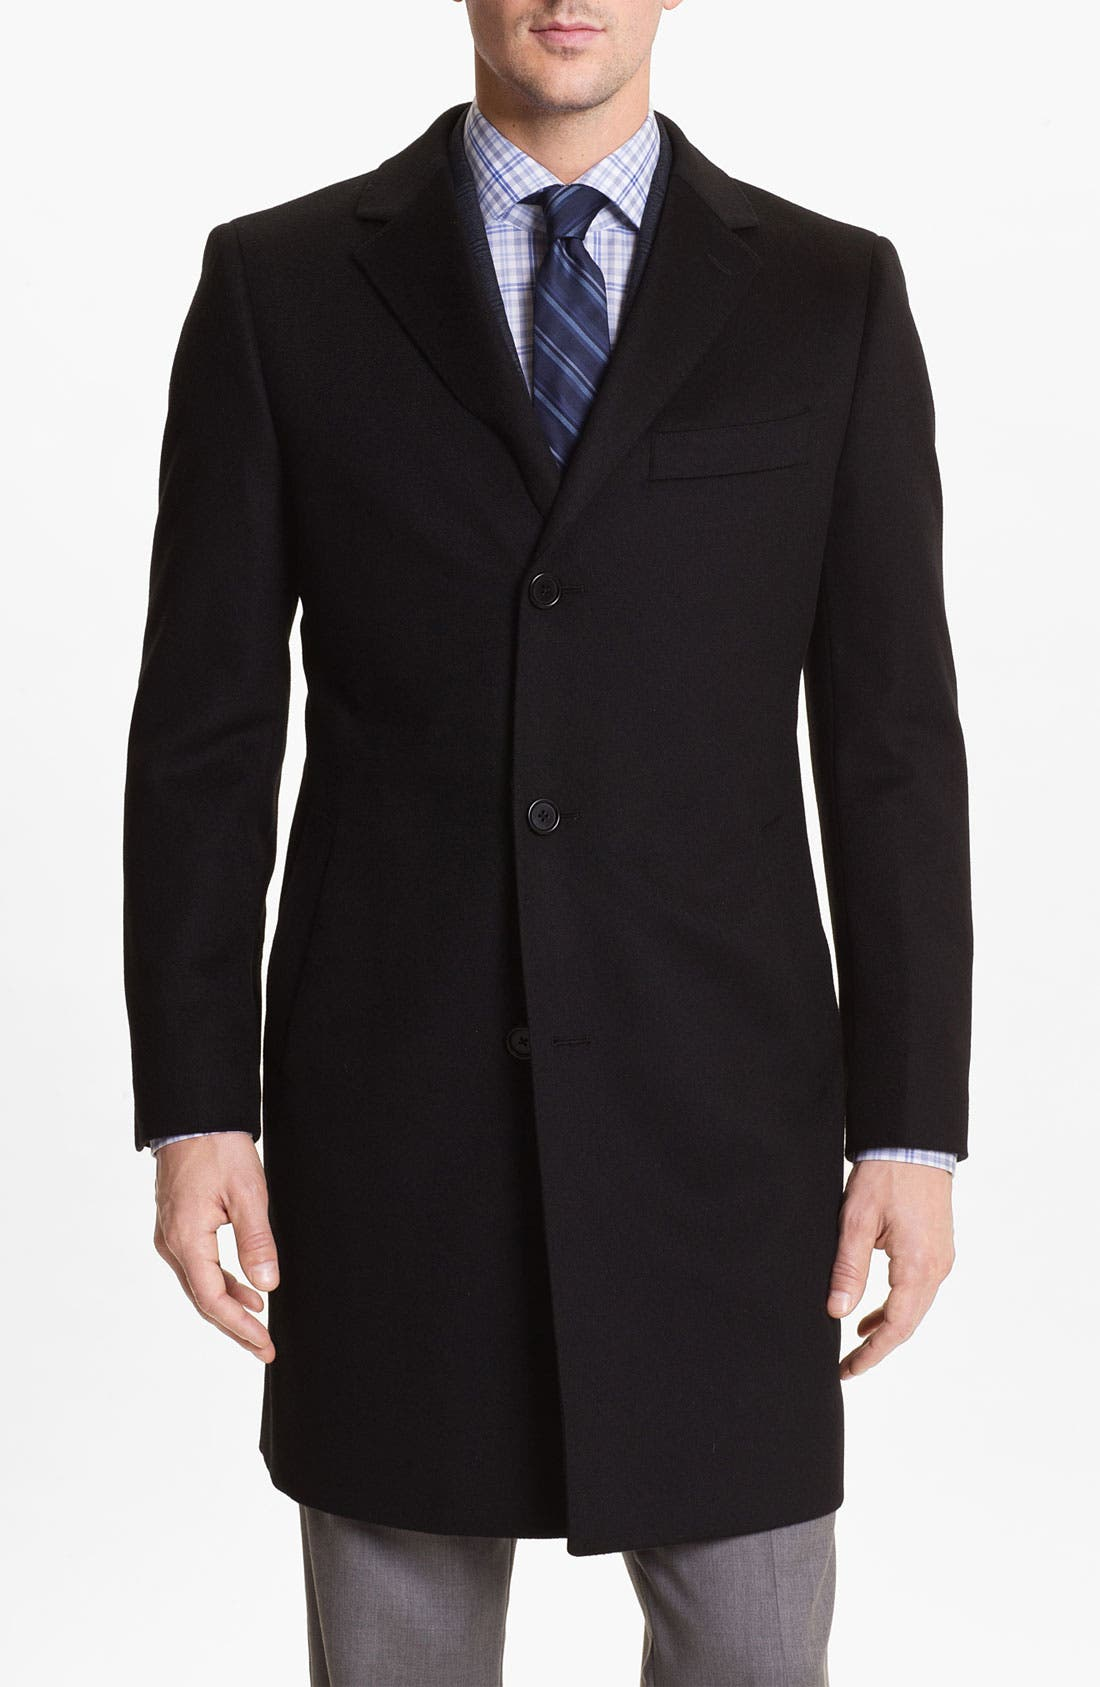 Alternate Image 1 Selected - Cardinal of Canada Wool Blend Topcoat